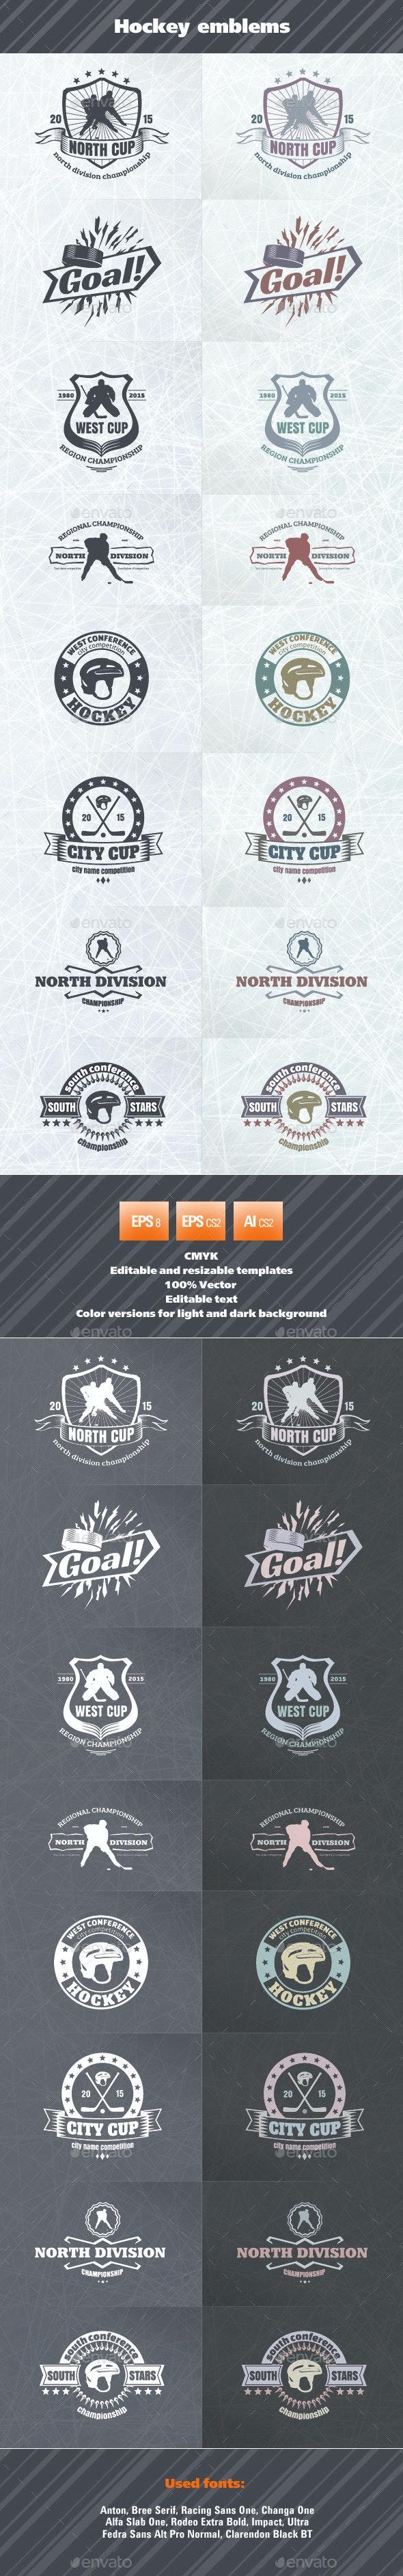 Hockey Emblems - Badges & Stickers Web Elements